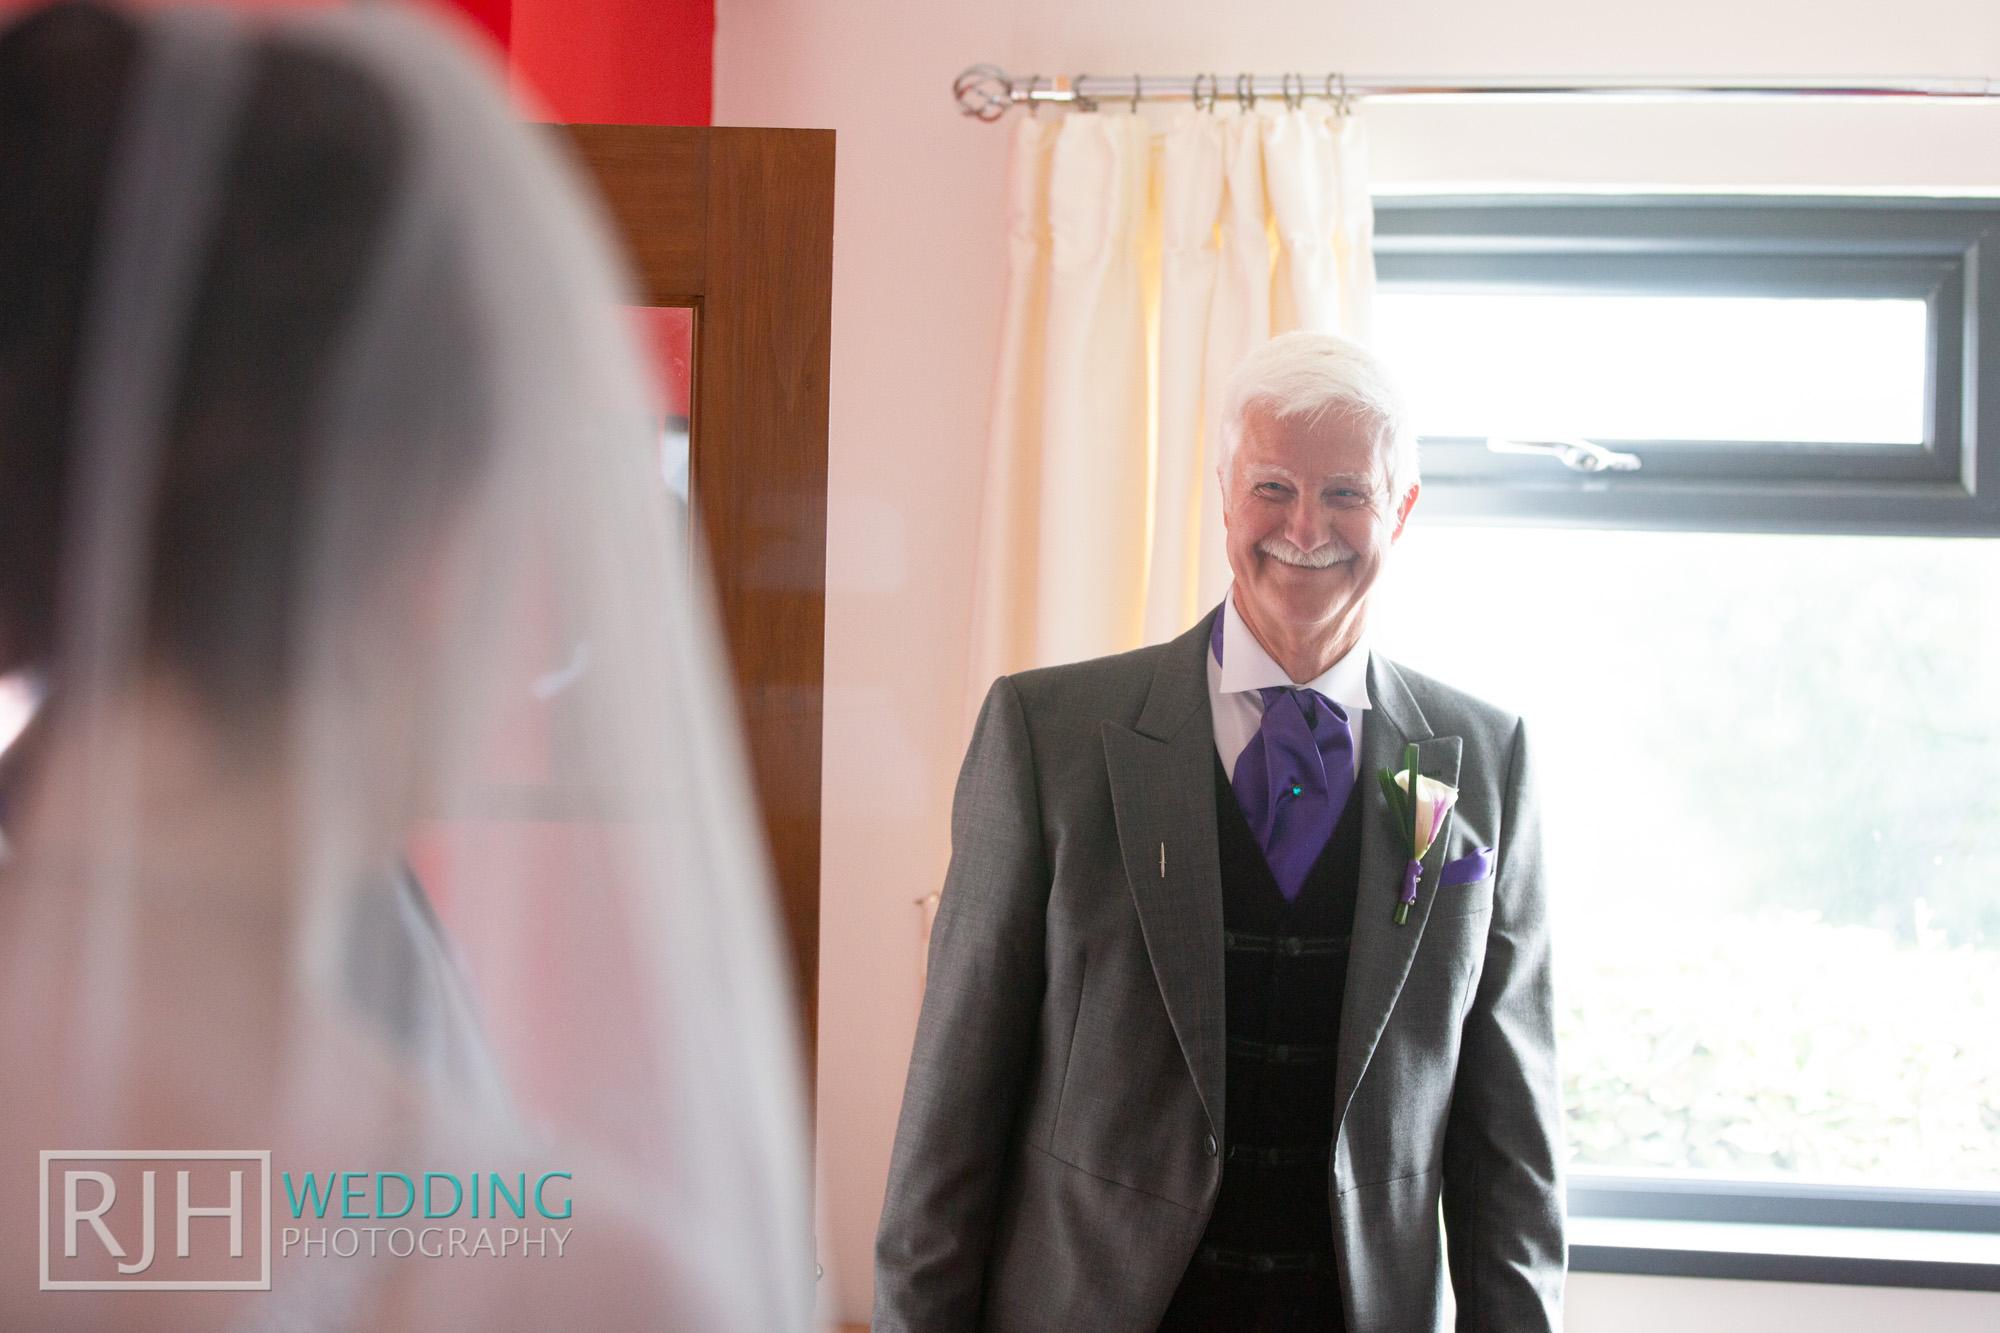 Oulton Hall Wedding Photography_Goodwill-Hall_014_RJH17158.jpg